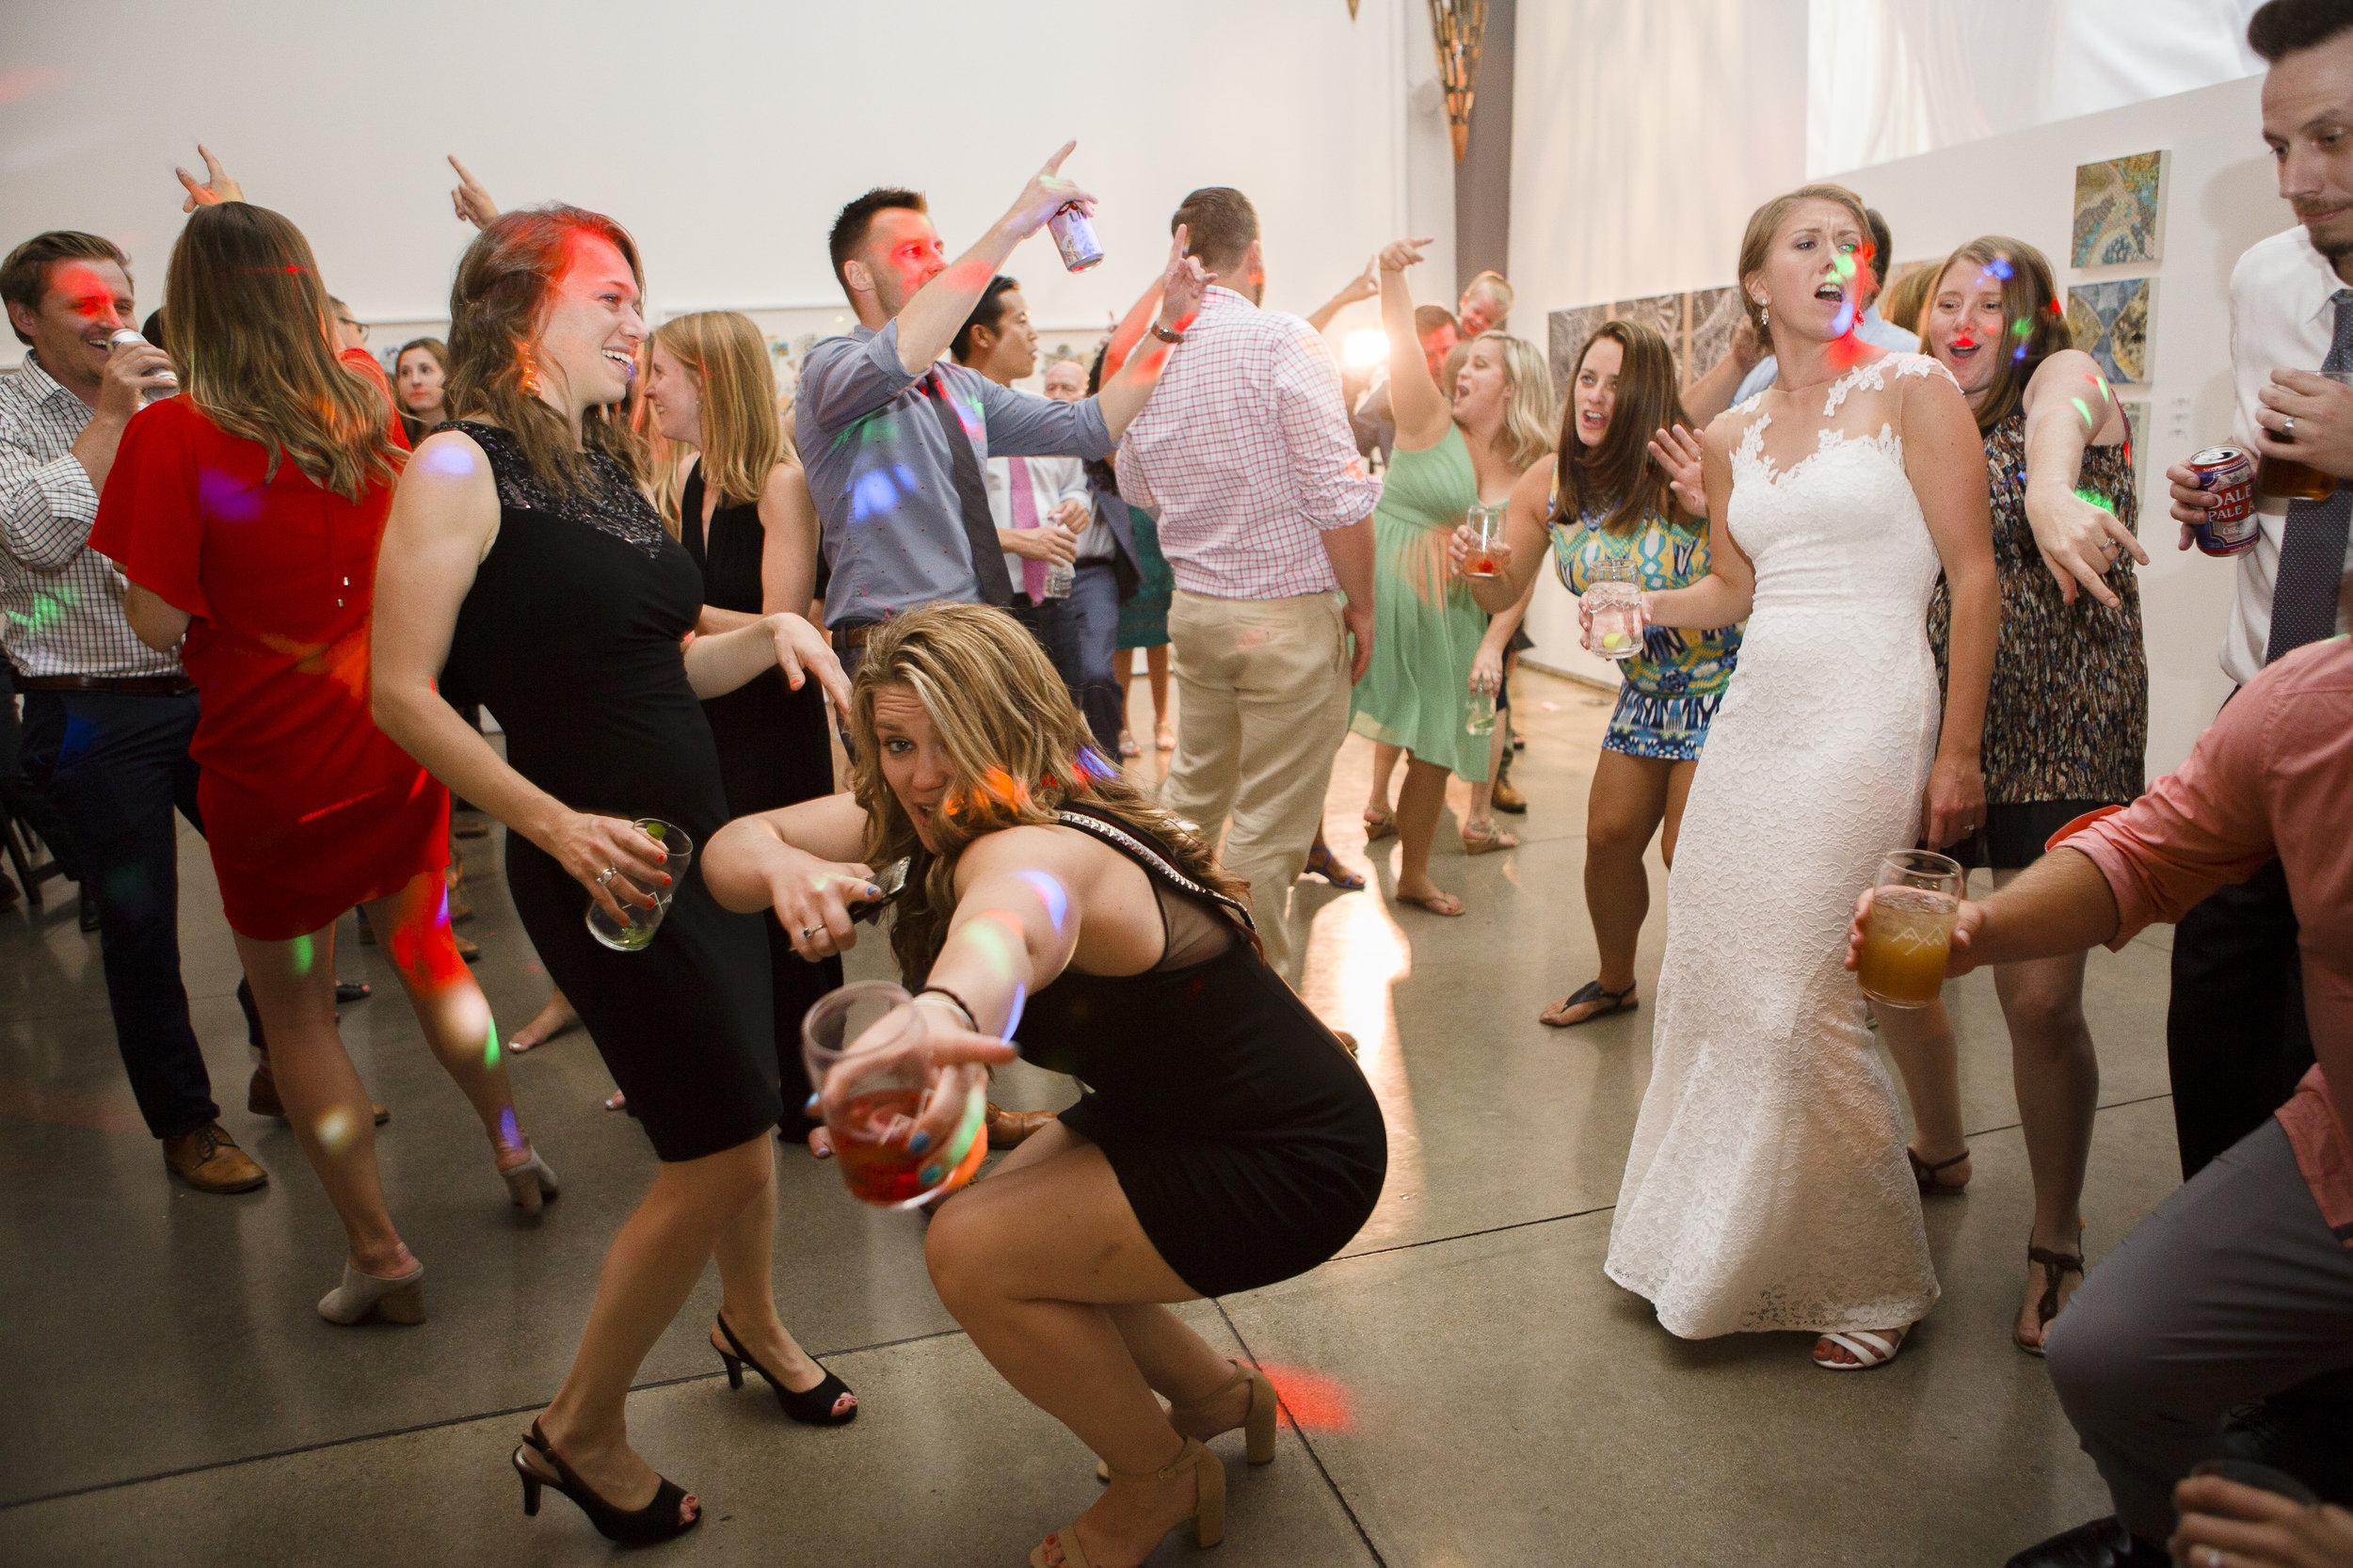 kristen-vance-space-gallery-denver-colorado-wedding-2017-3.jpg